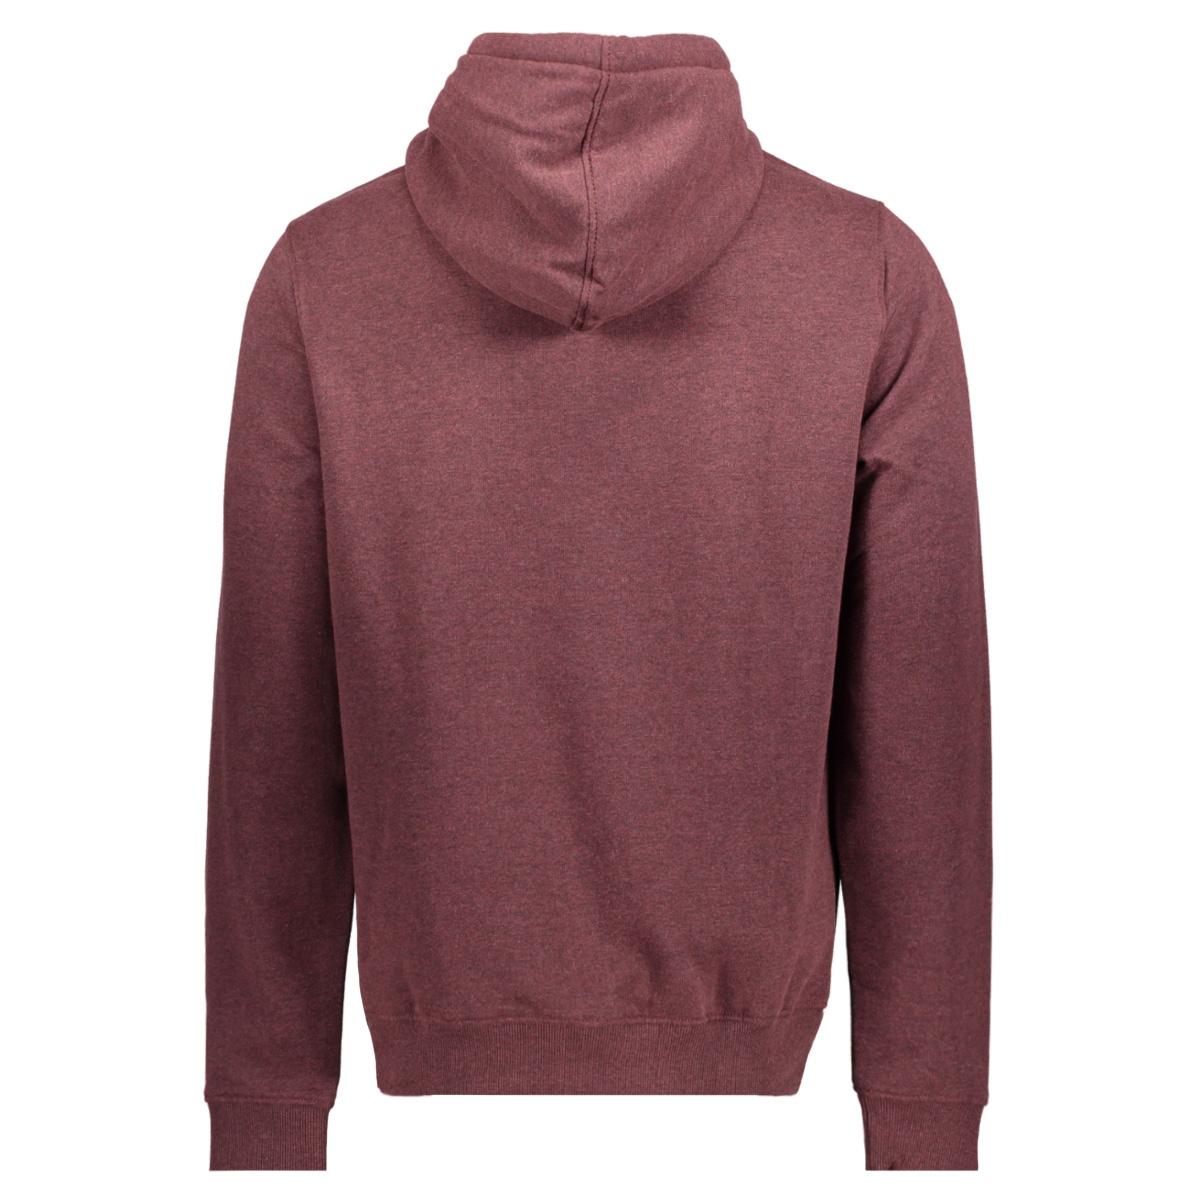 psw176420 pme legend sweater 3831